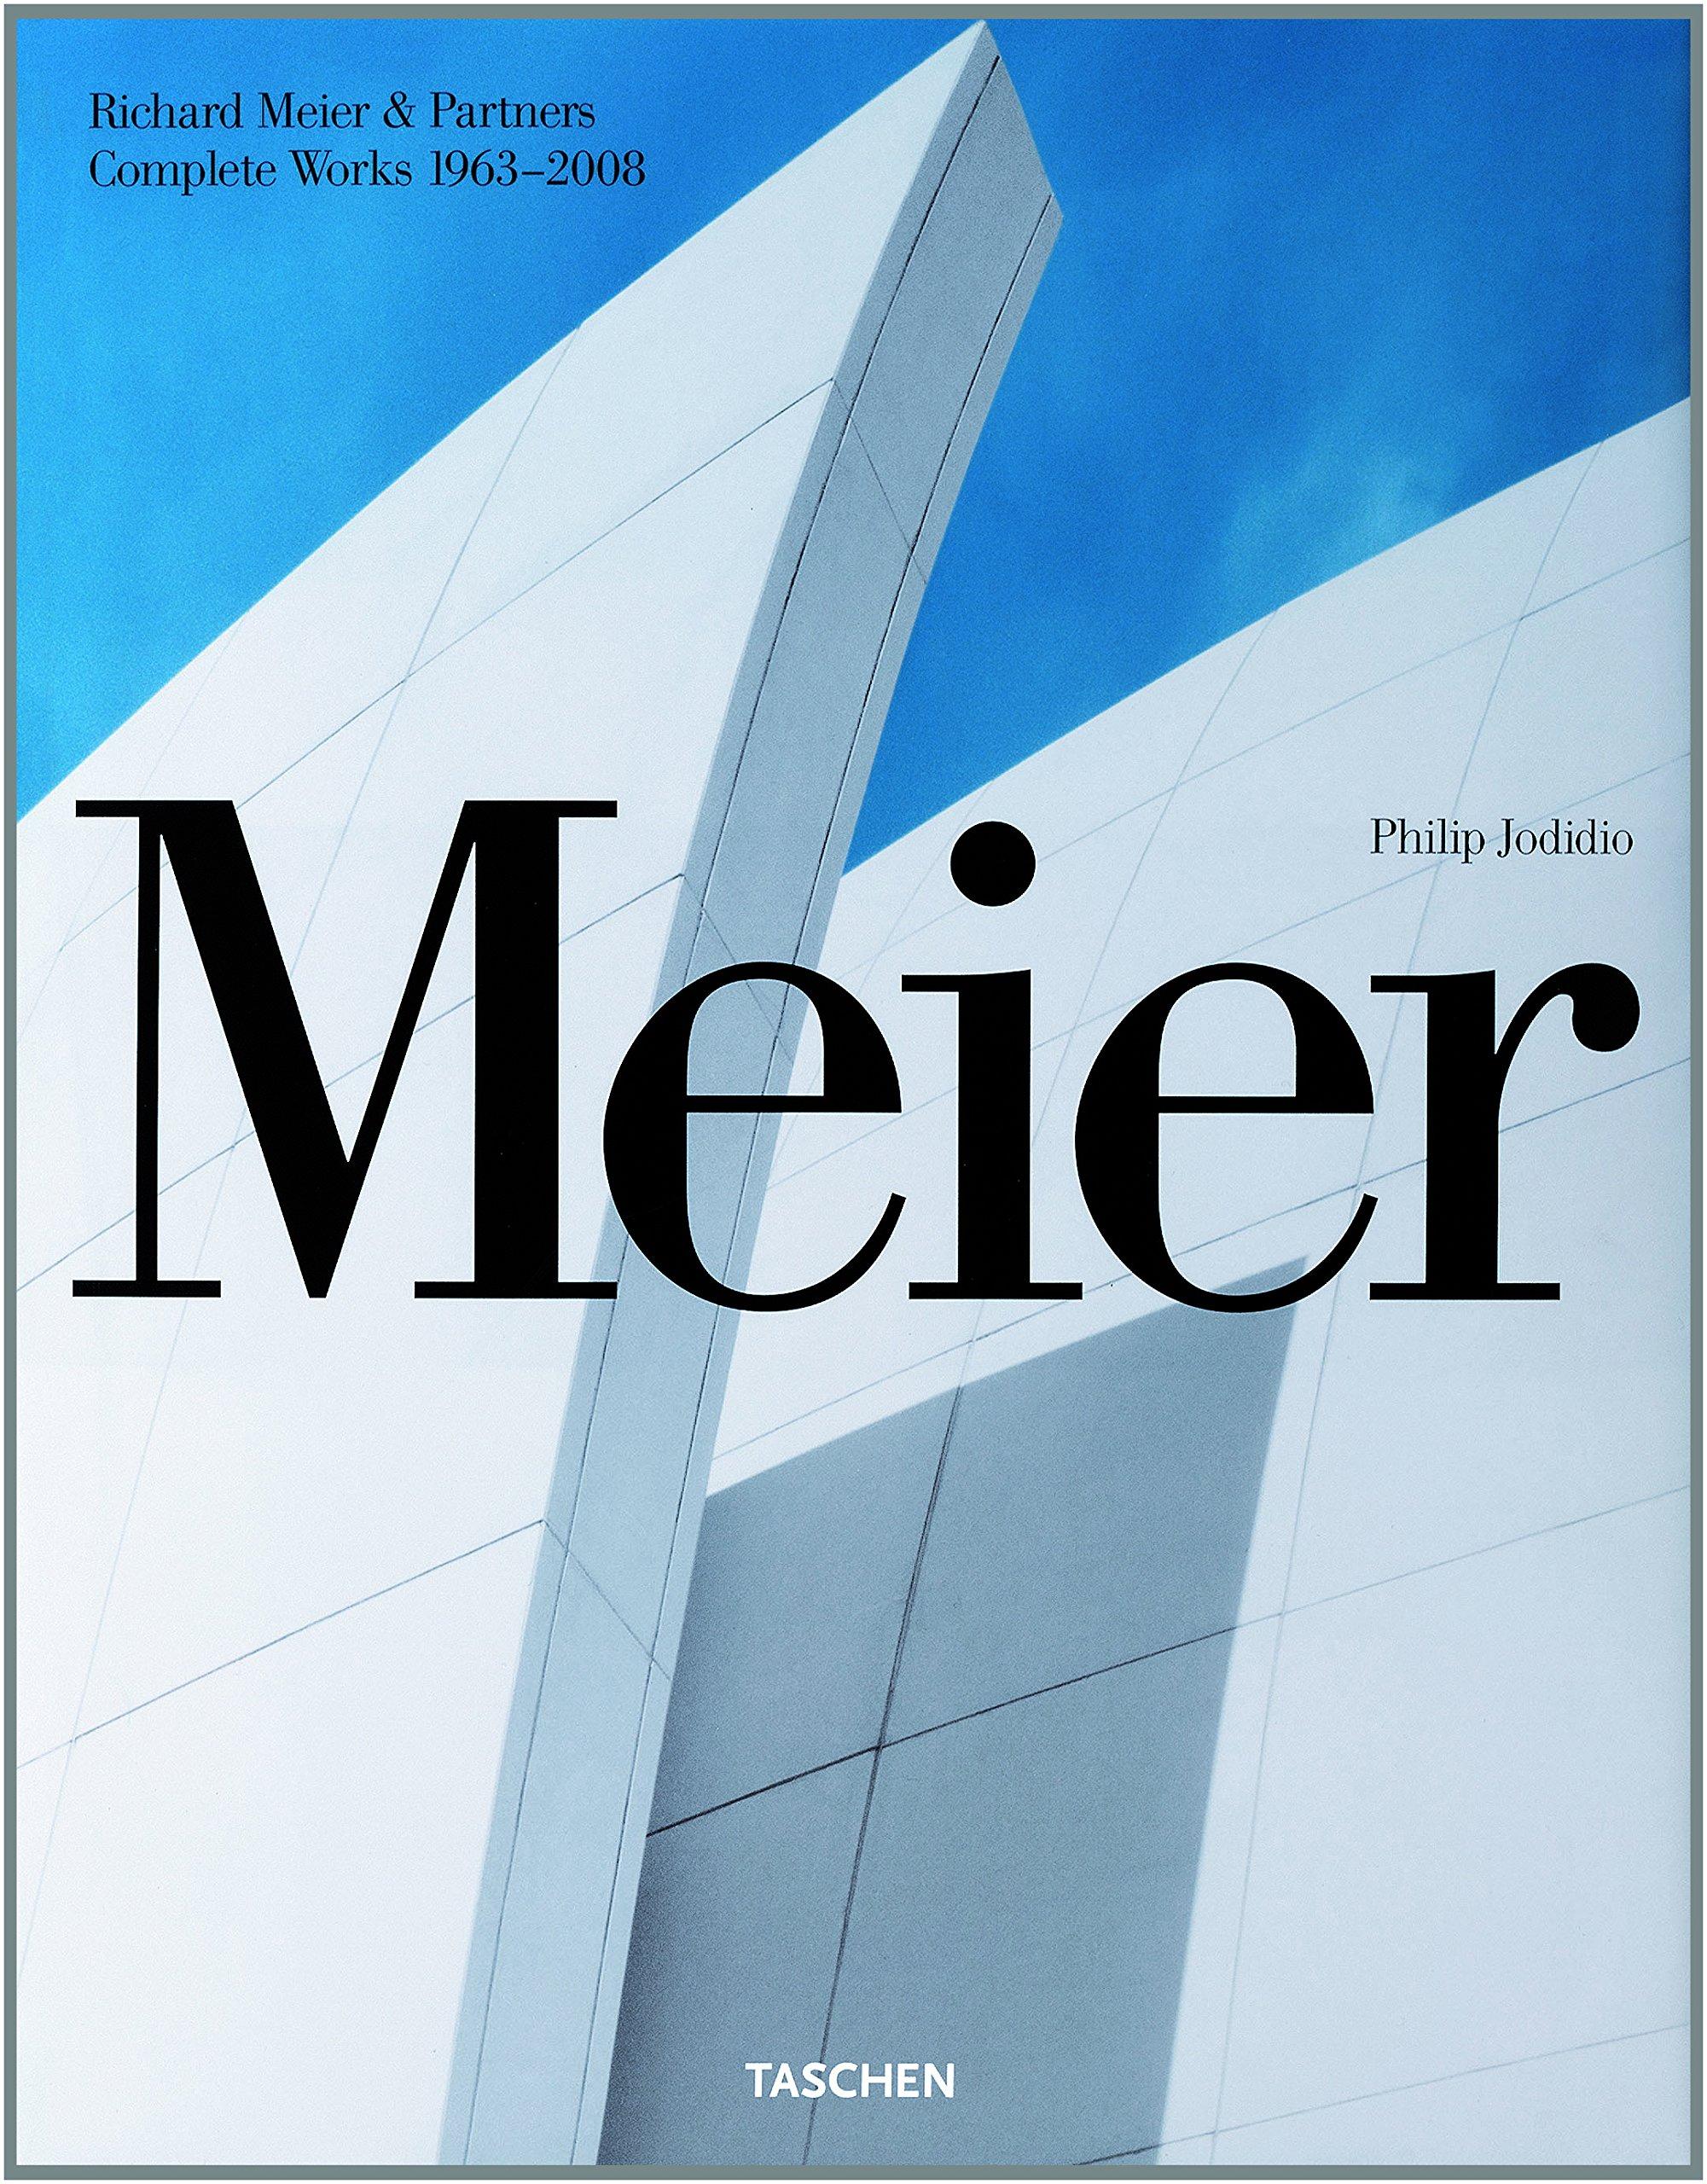 Meier. Ediz. illustrata Copertina rigida – 30 apr 2008 Philip Jodidio Taschen 3822836842 Architecture